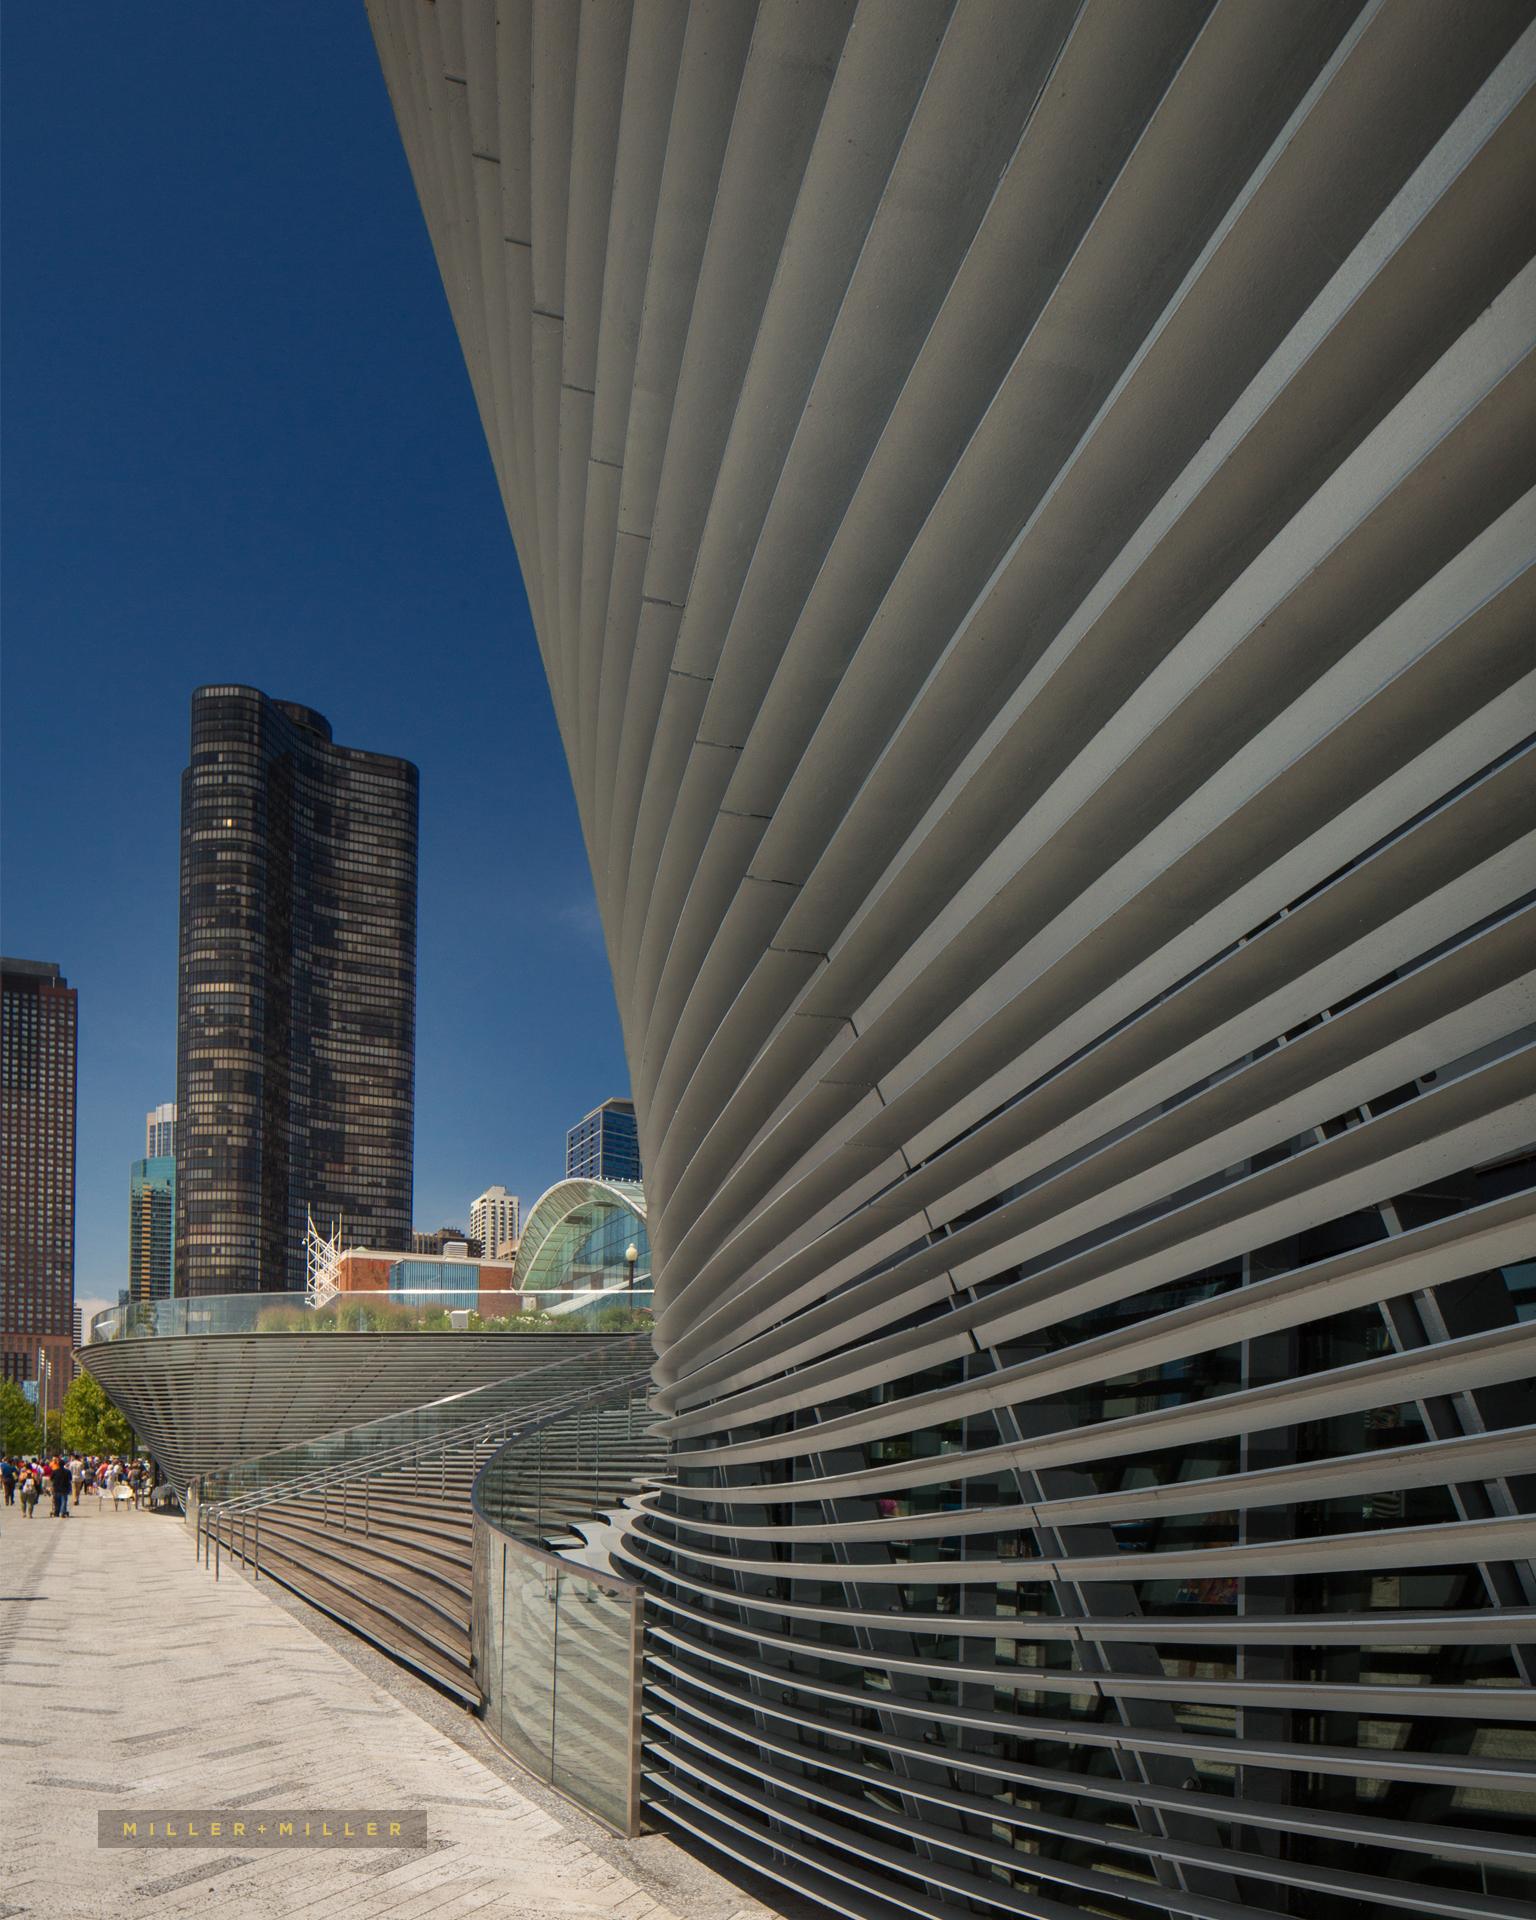 urban infrastructure architect design chicago images